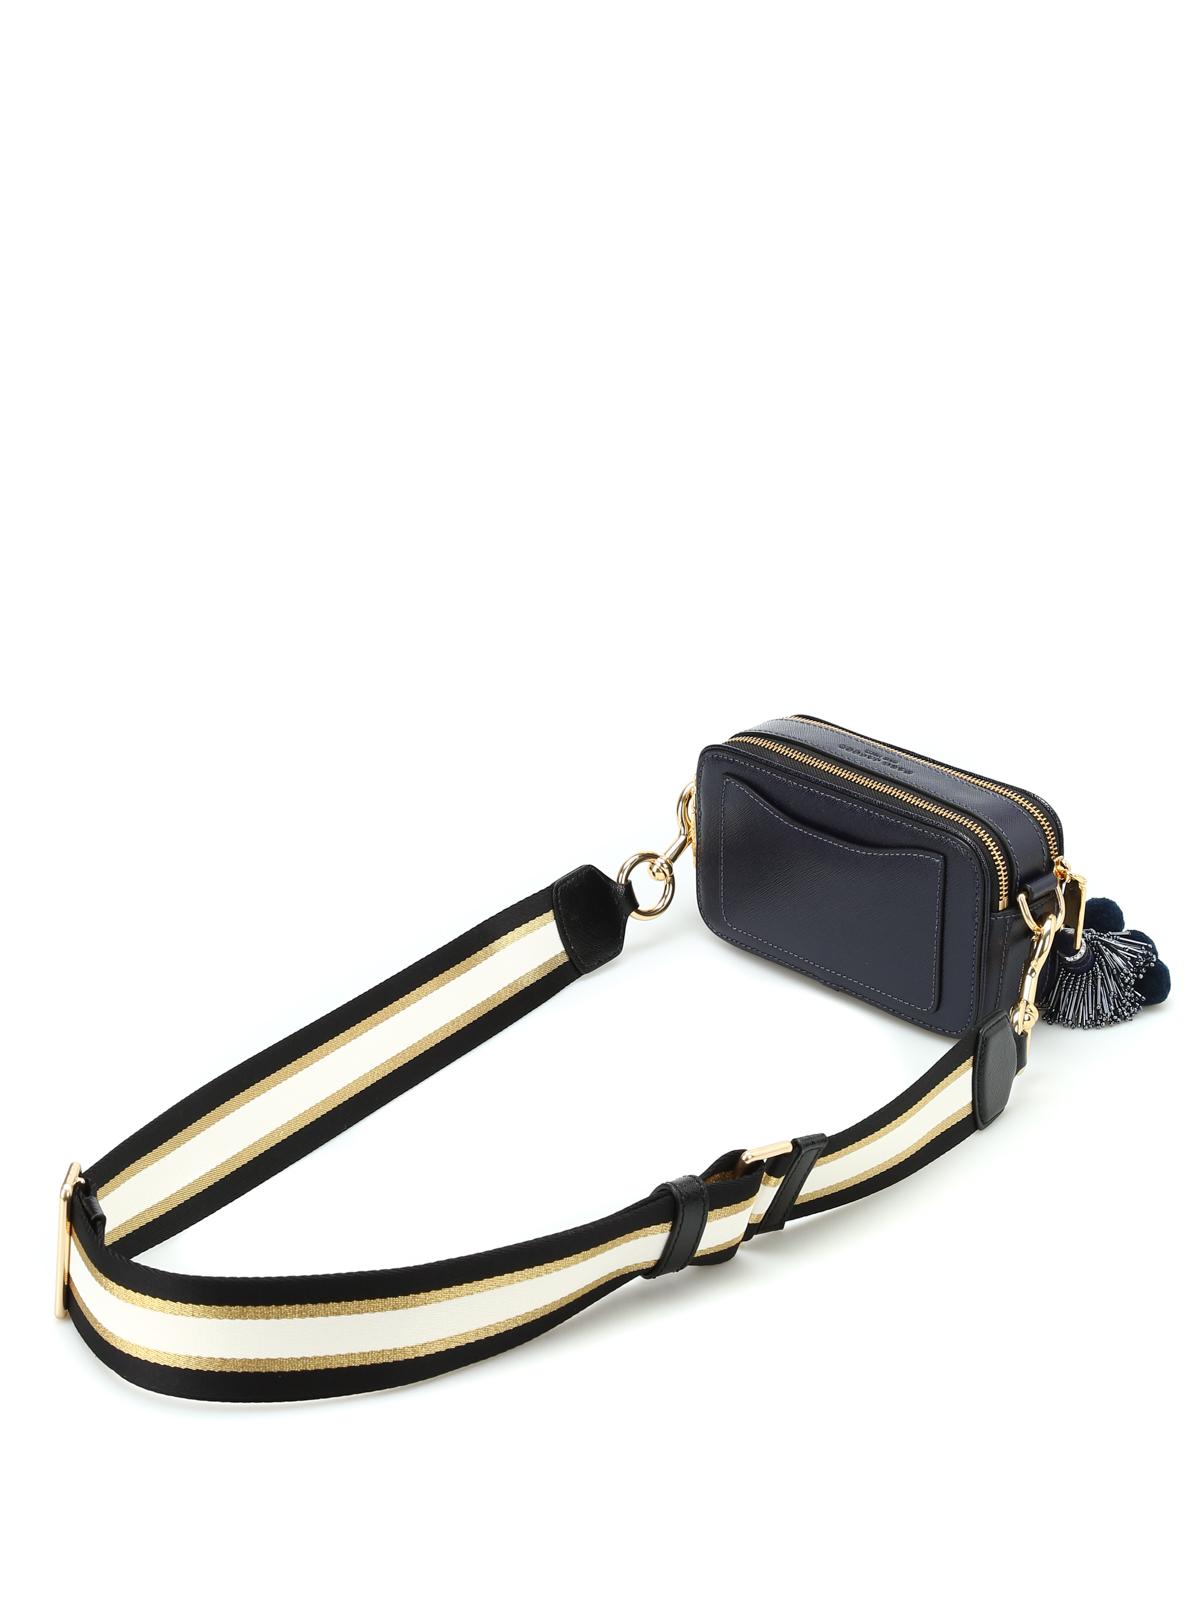 5a279447380f iKRIX MARC JACOBS  cross body bags - Small Damask Snapshot camera bag